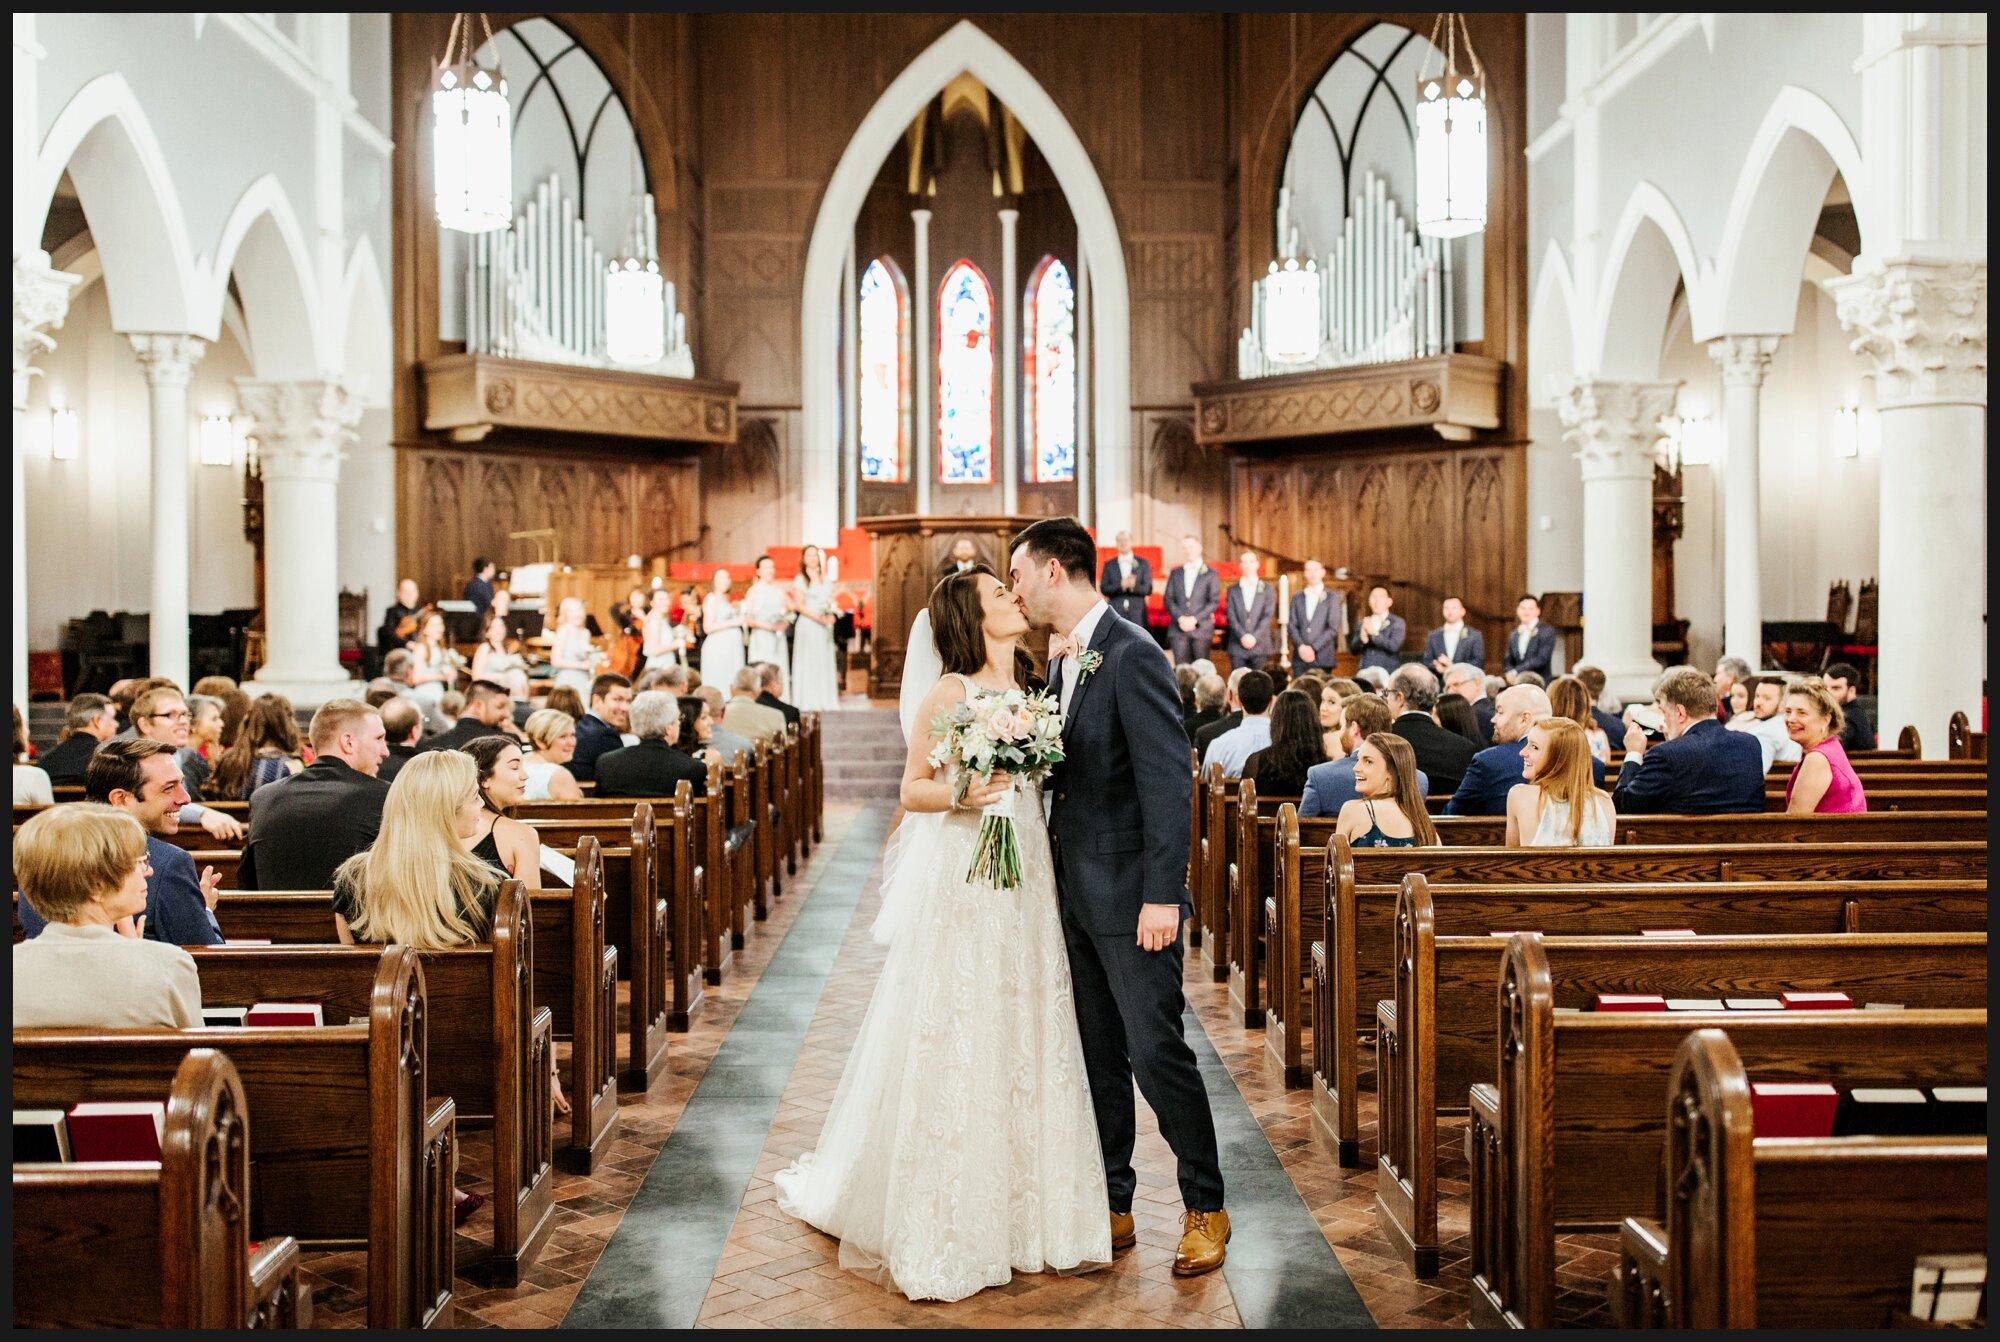 Orlando-Wedding-Photographer-destination-wedding-photographer-florida-wedding-photographer-hawaii-wedding-photographer_0682.jpg